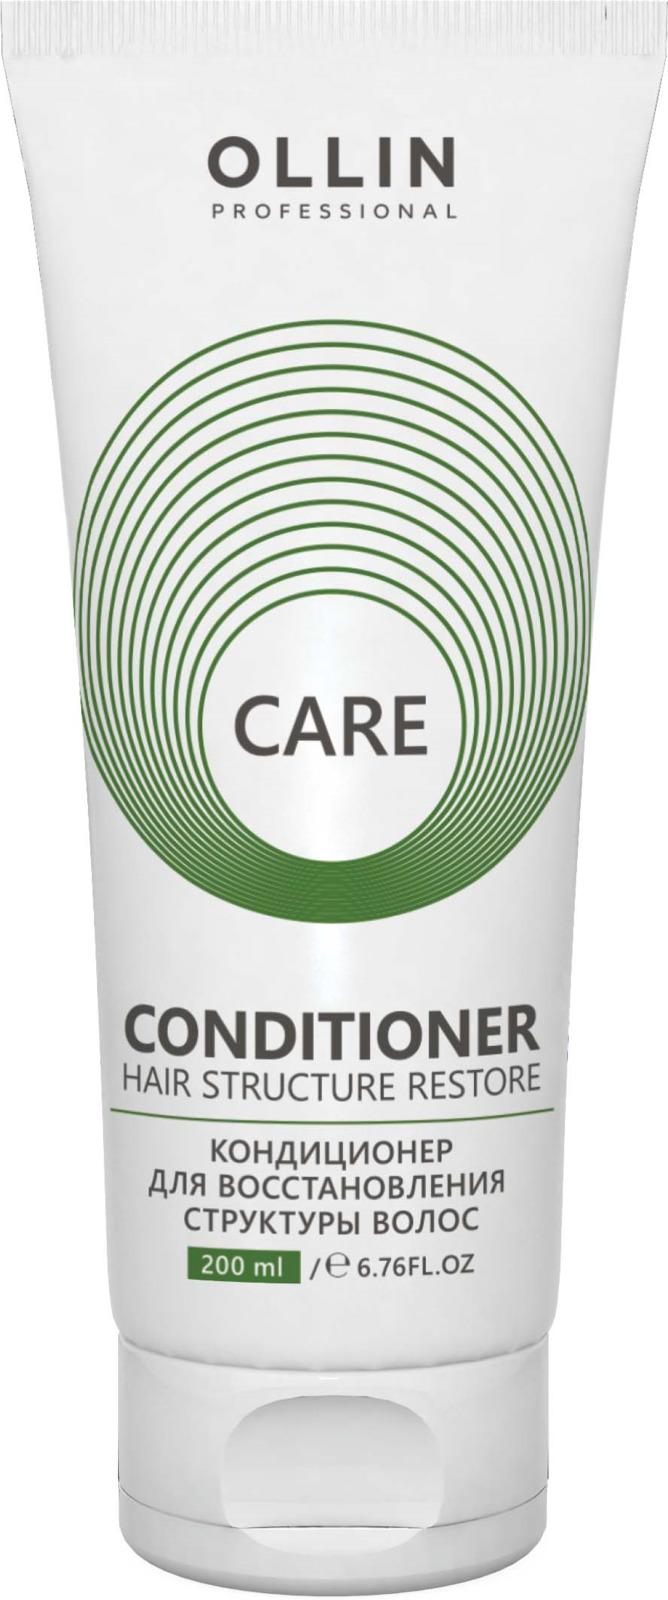 Ollin Кондиционер для восстановления структуры волос Care Restore Conditioner 200 мл кондиционер schwarzkopf blondme keratin restore blonde conditioner объем 200 мл